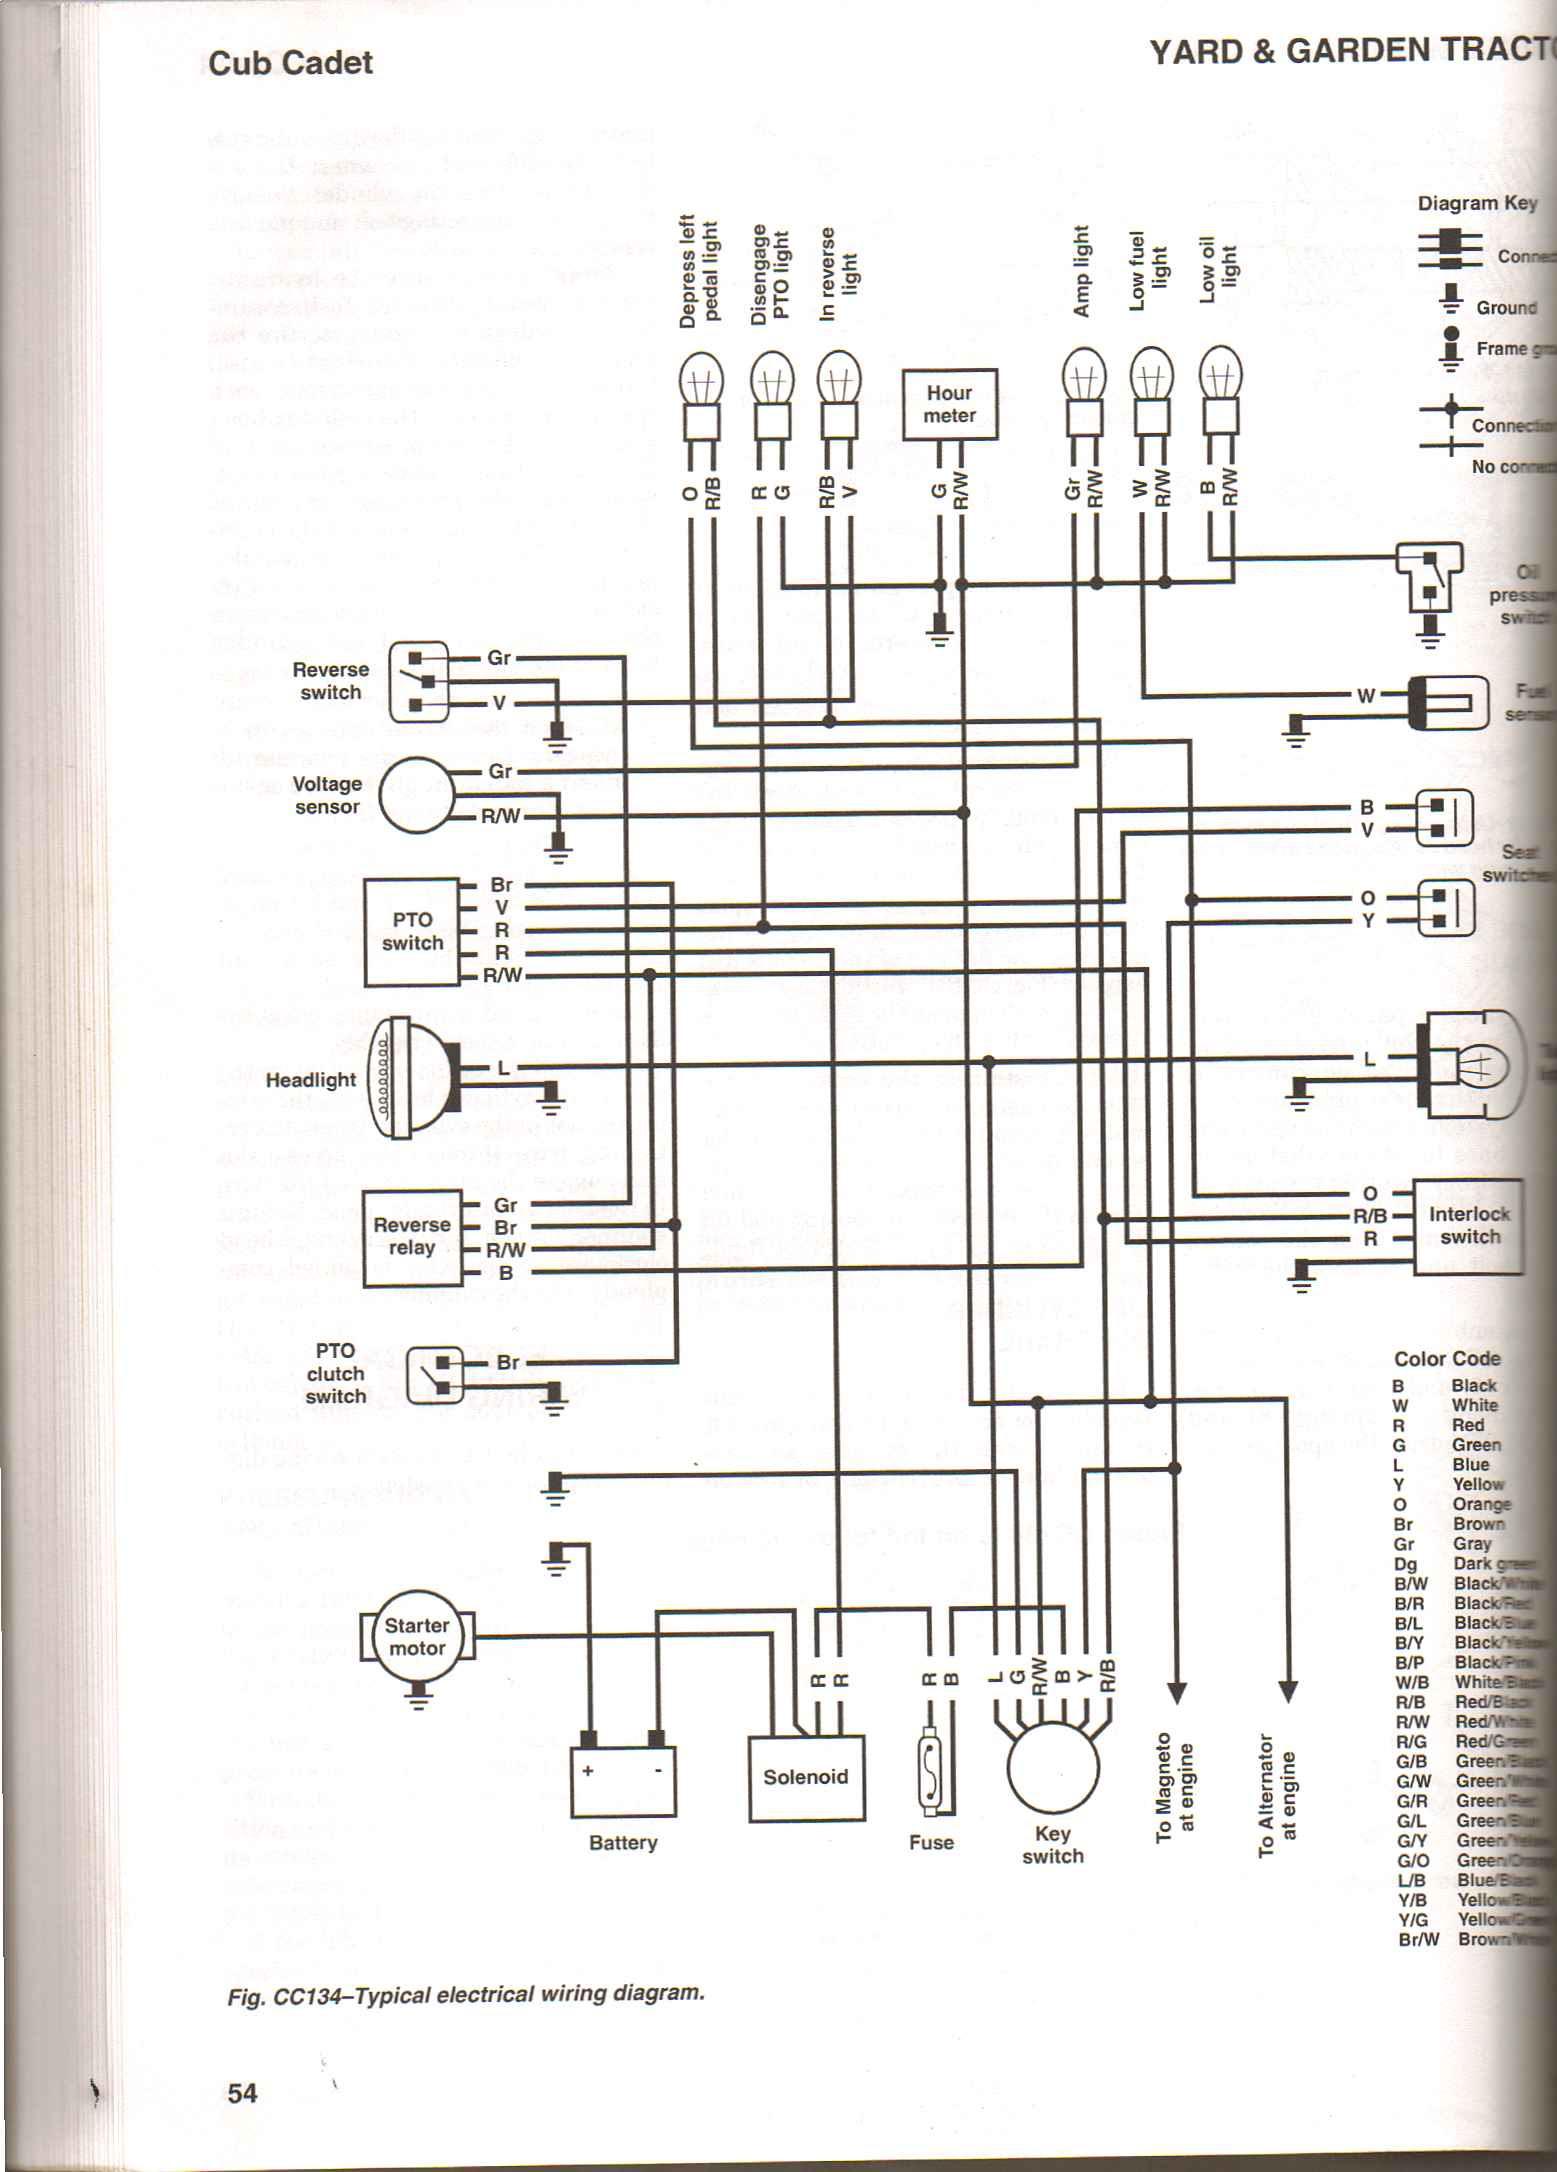 3 Way Switch Wiring Cub Cadet 2135 Wiring Schematic Hd Quality Taia Lintreccio It